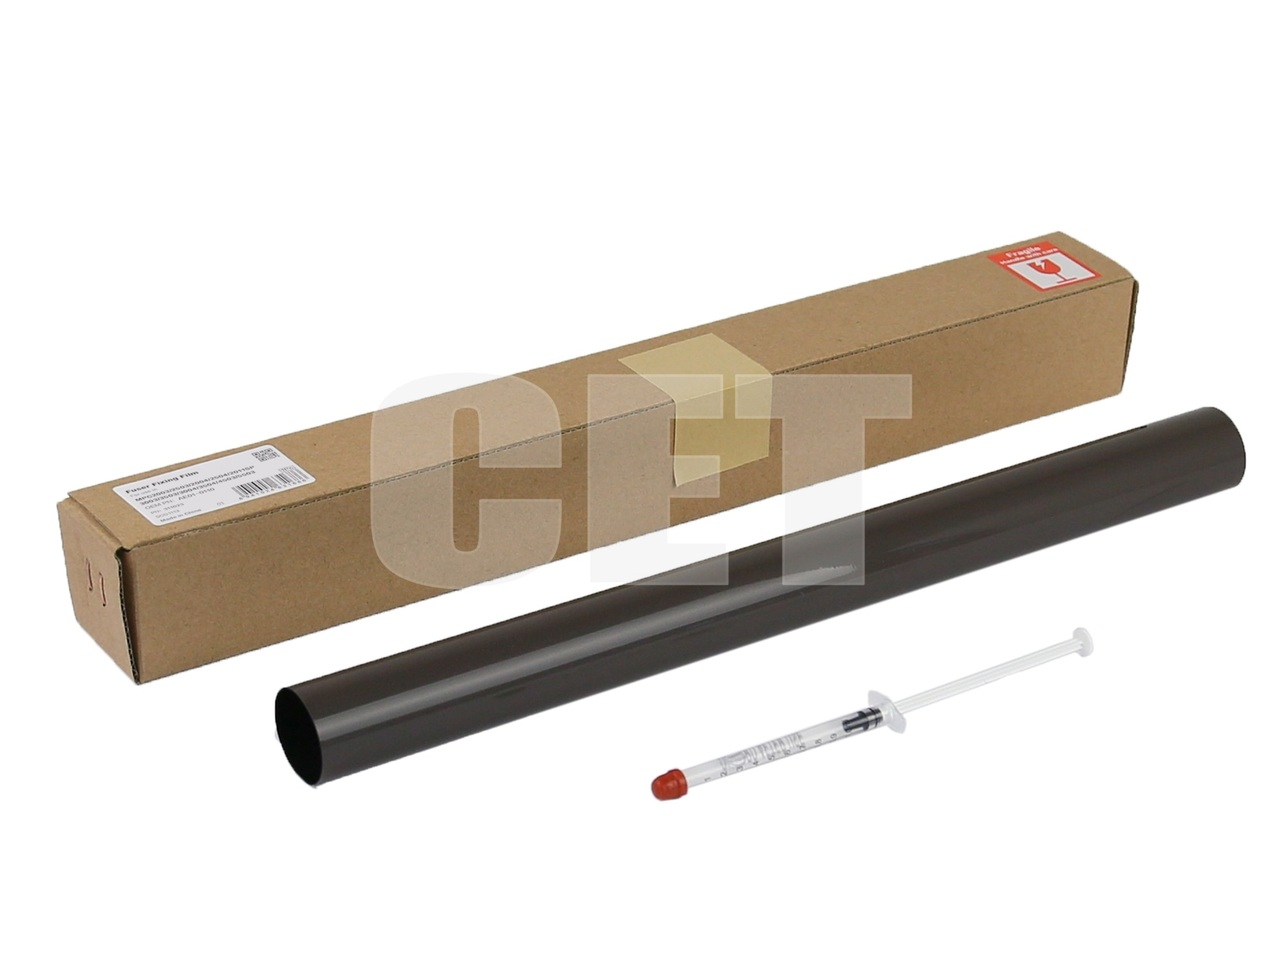 Термопленка (Metal) AE01-0110 для RICOHMPC2003/3503/MPC4503/5503/6003 (CET), CET311023